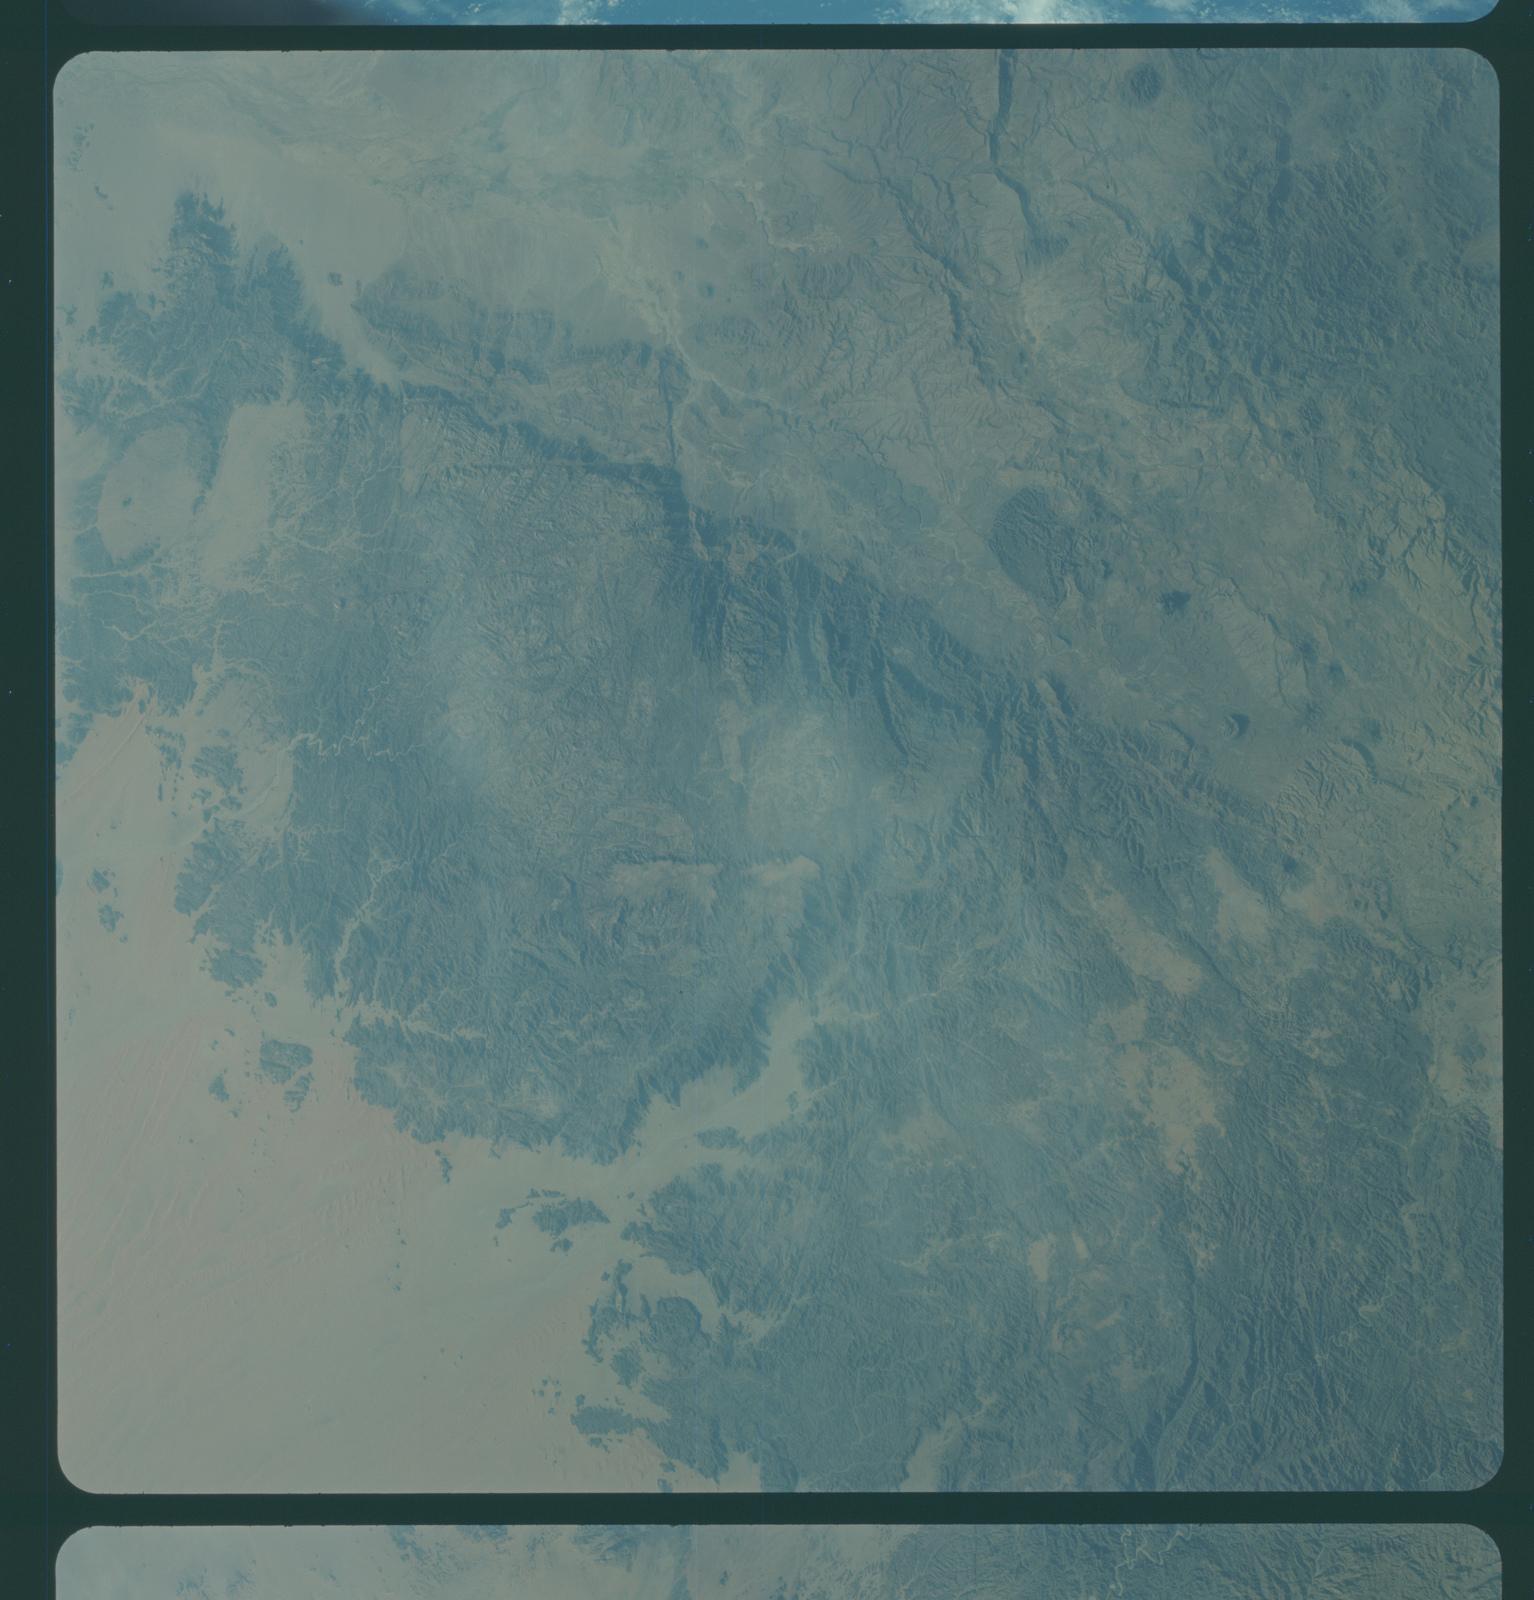 Gemini IV Mission Image -  Southwest Saudi Arabia, Yeman and Aden Protectorate